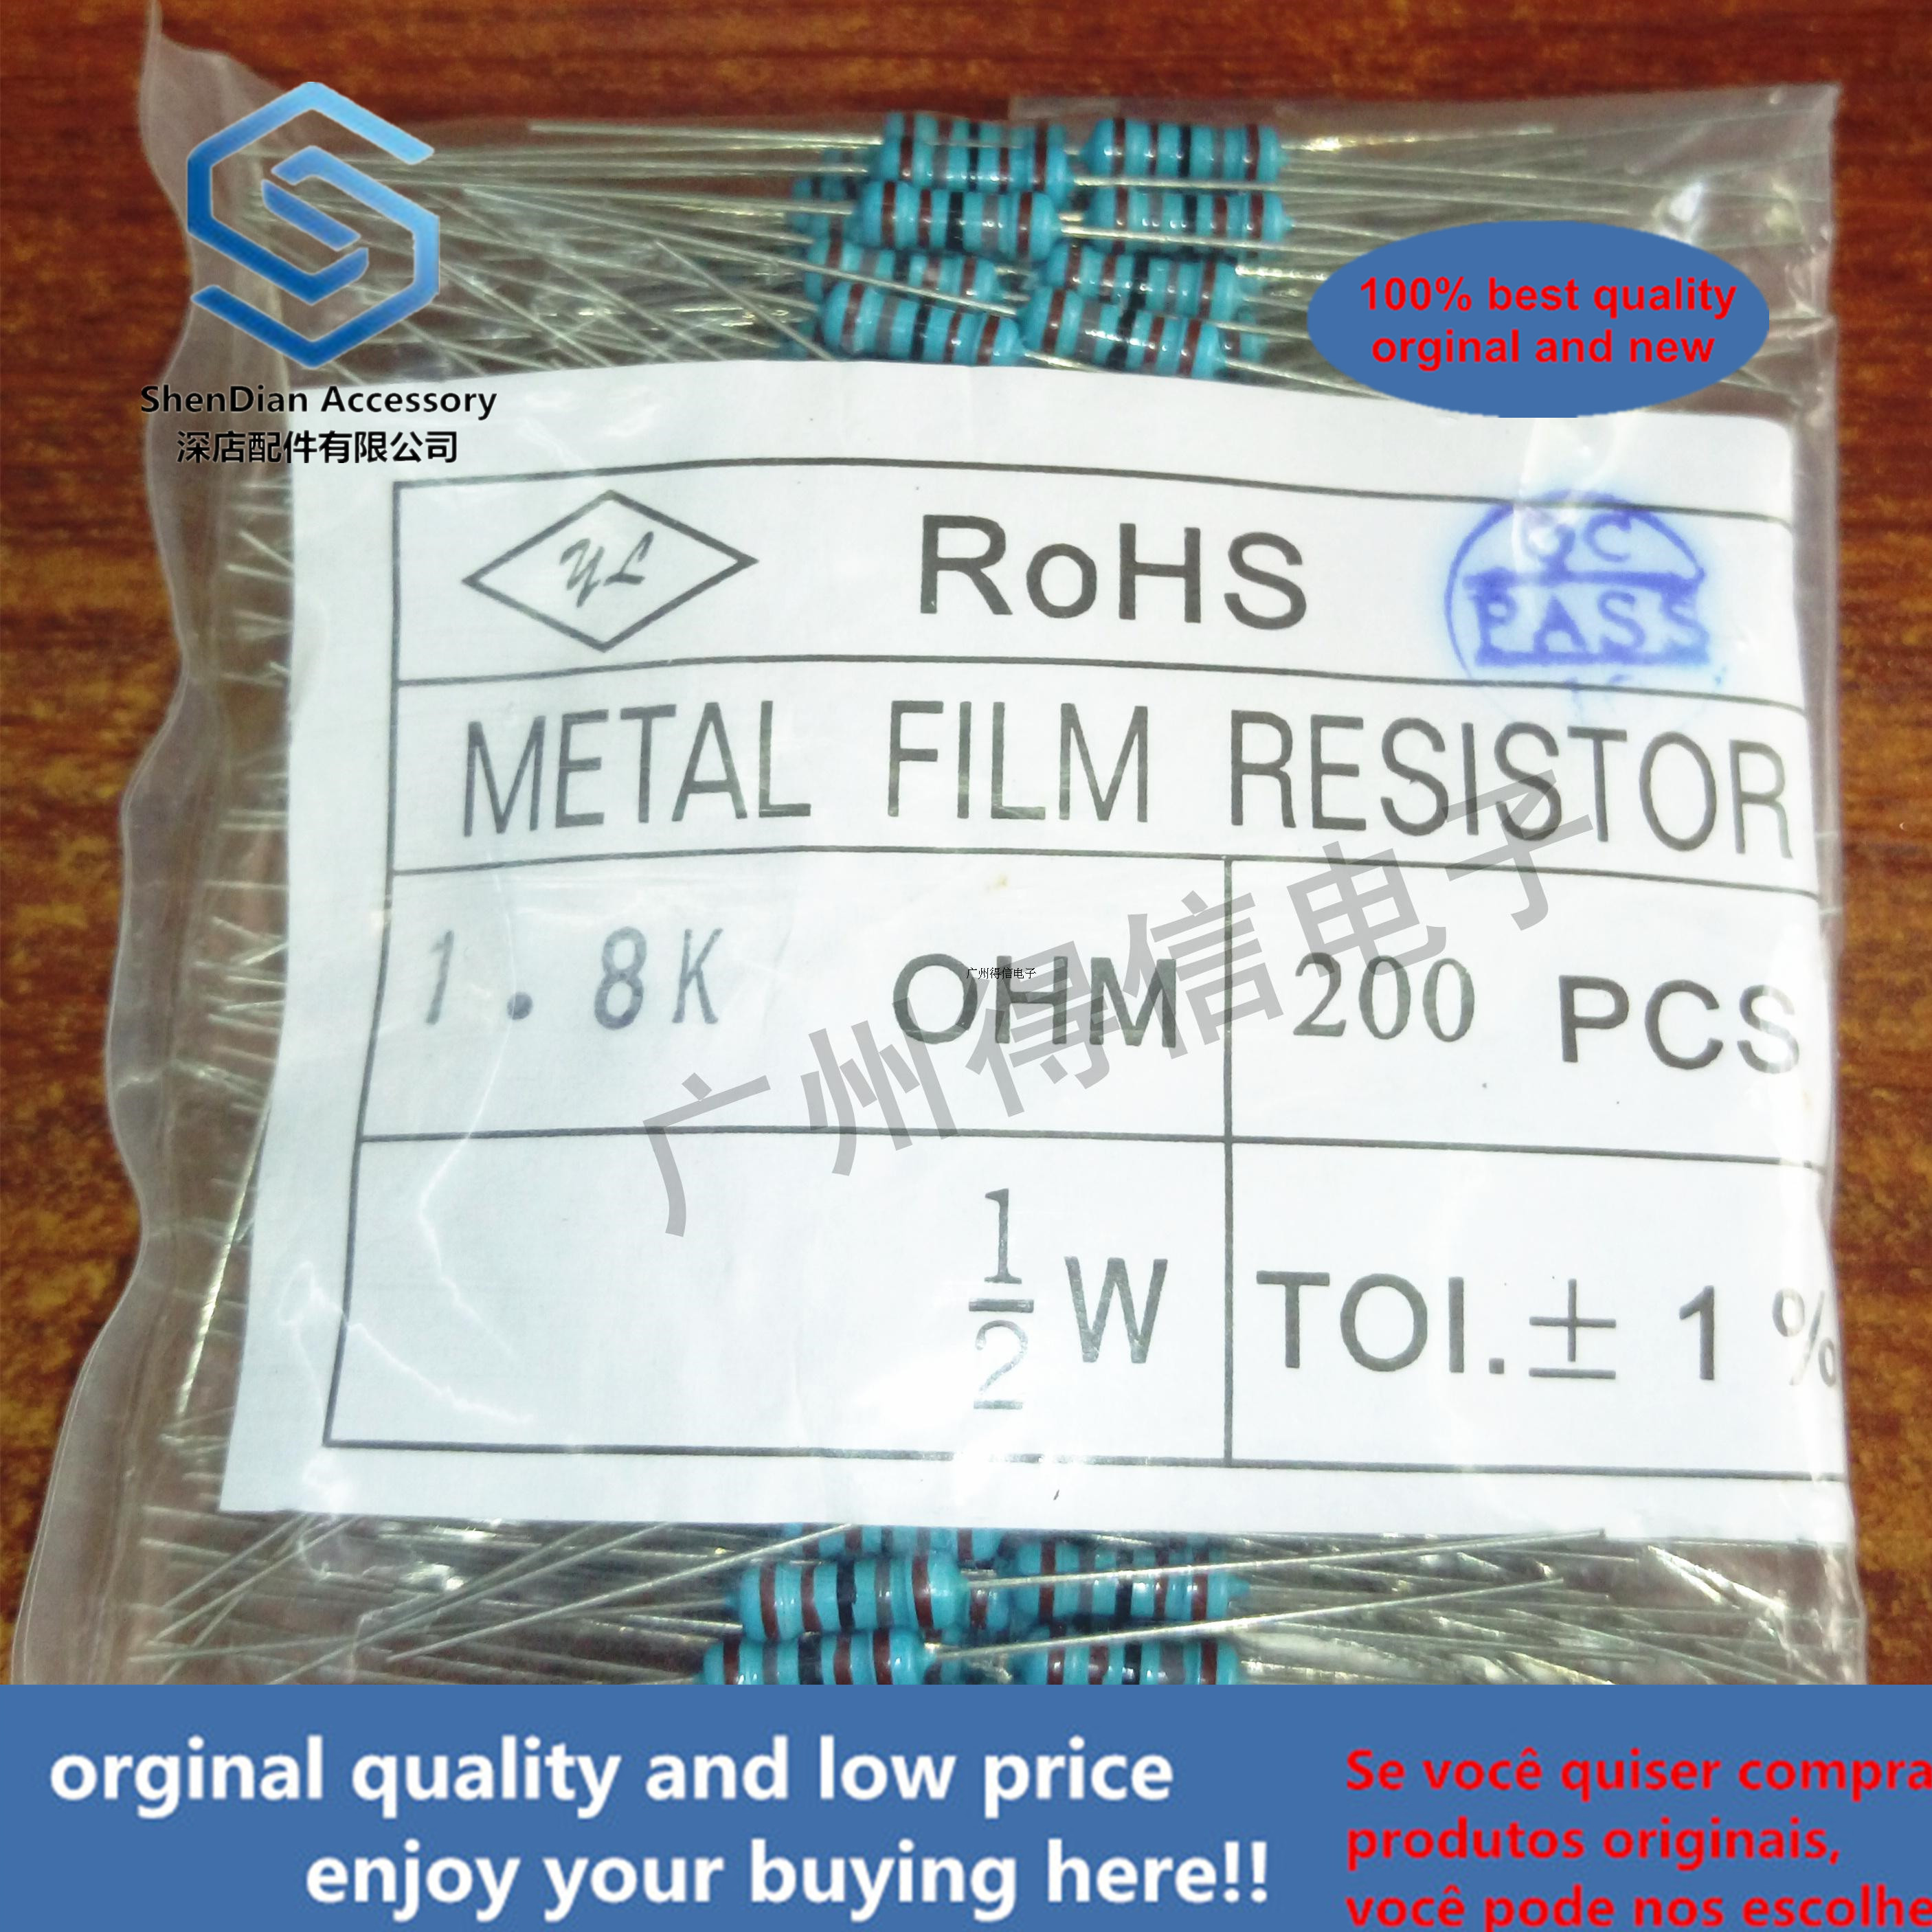 200pcs 1 / 2W 1M 1% Brand New Metal Film Iron Feet Resistor Bag 200 Pcs Per Pack